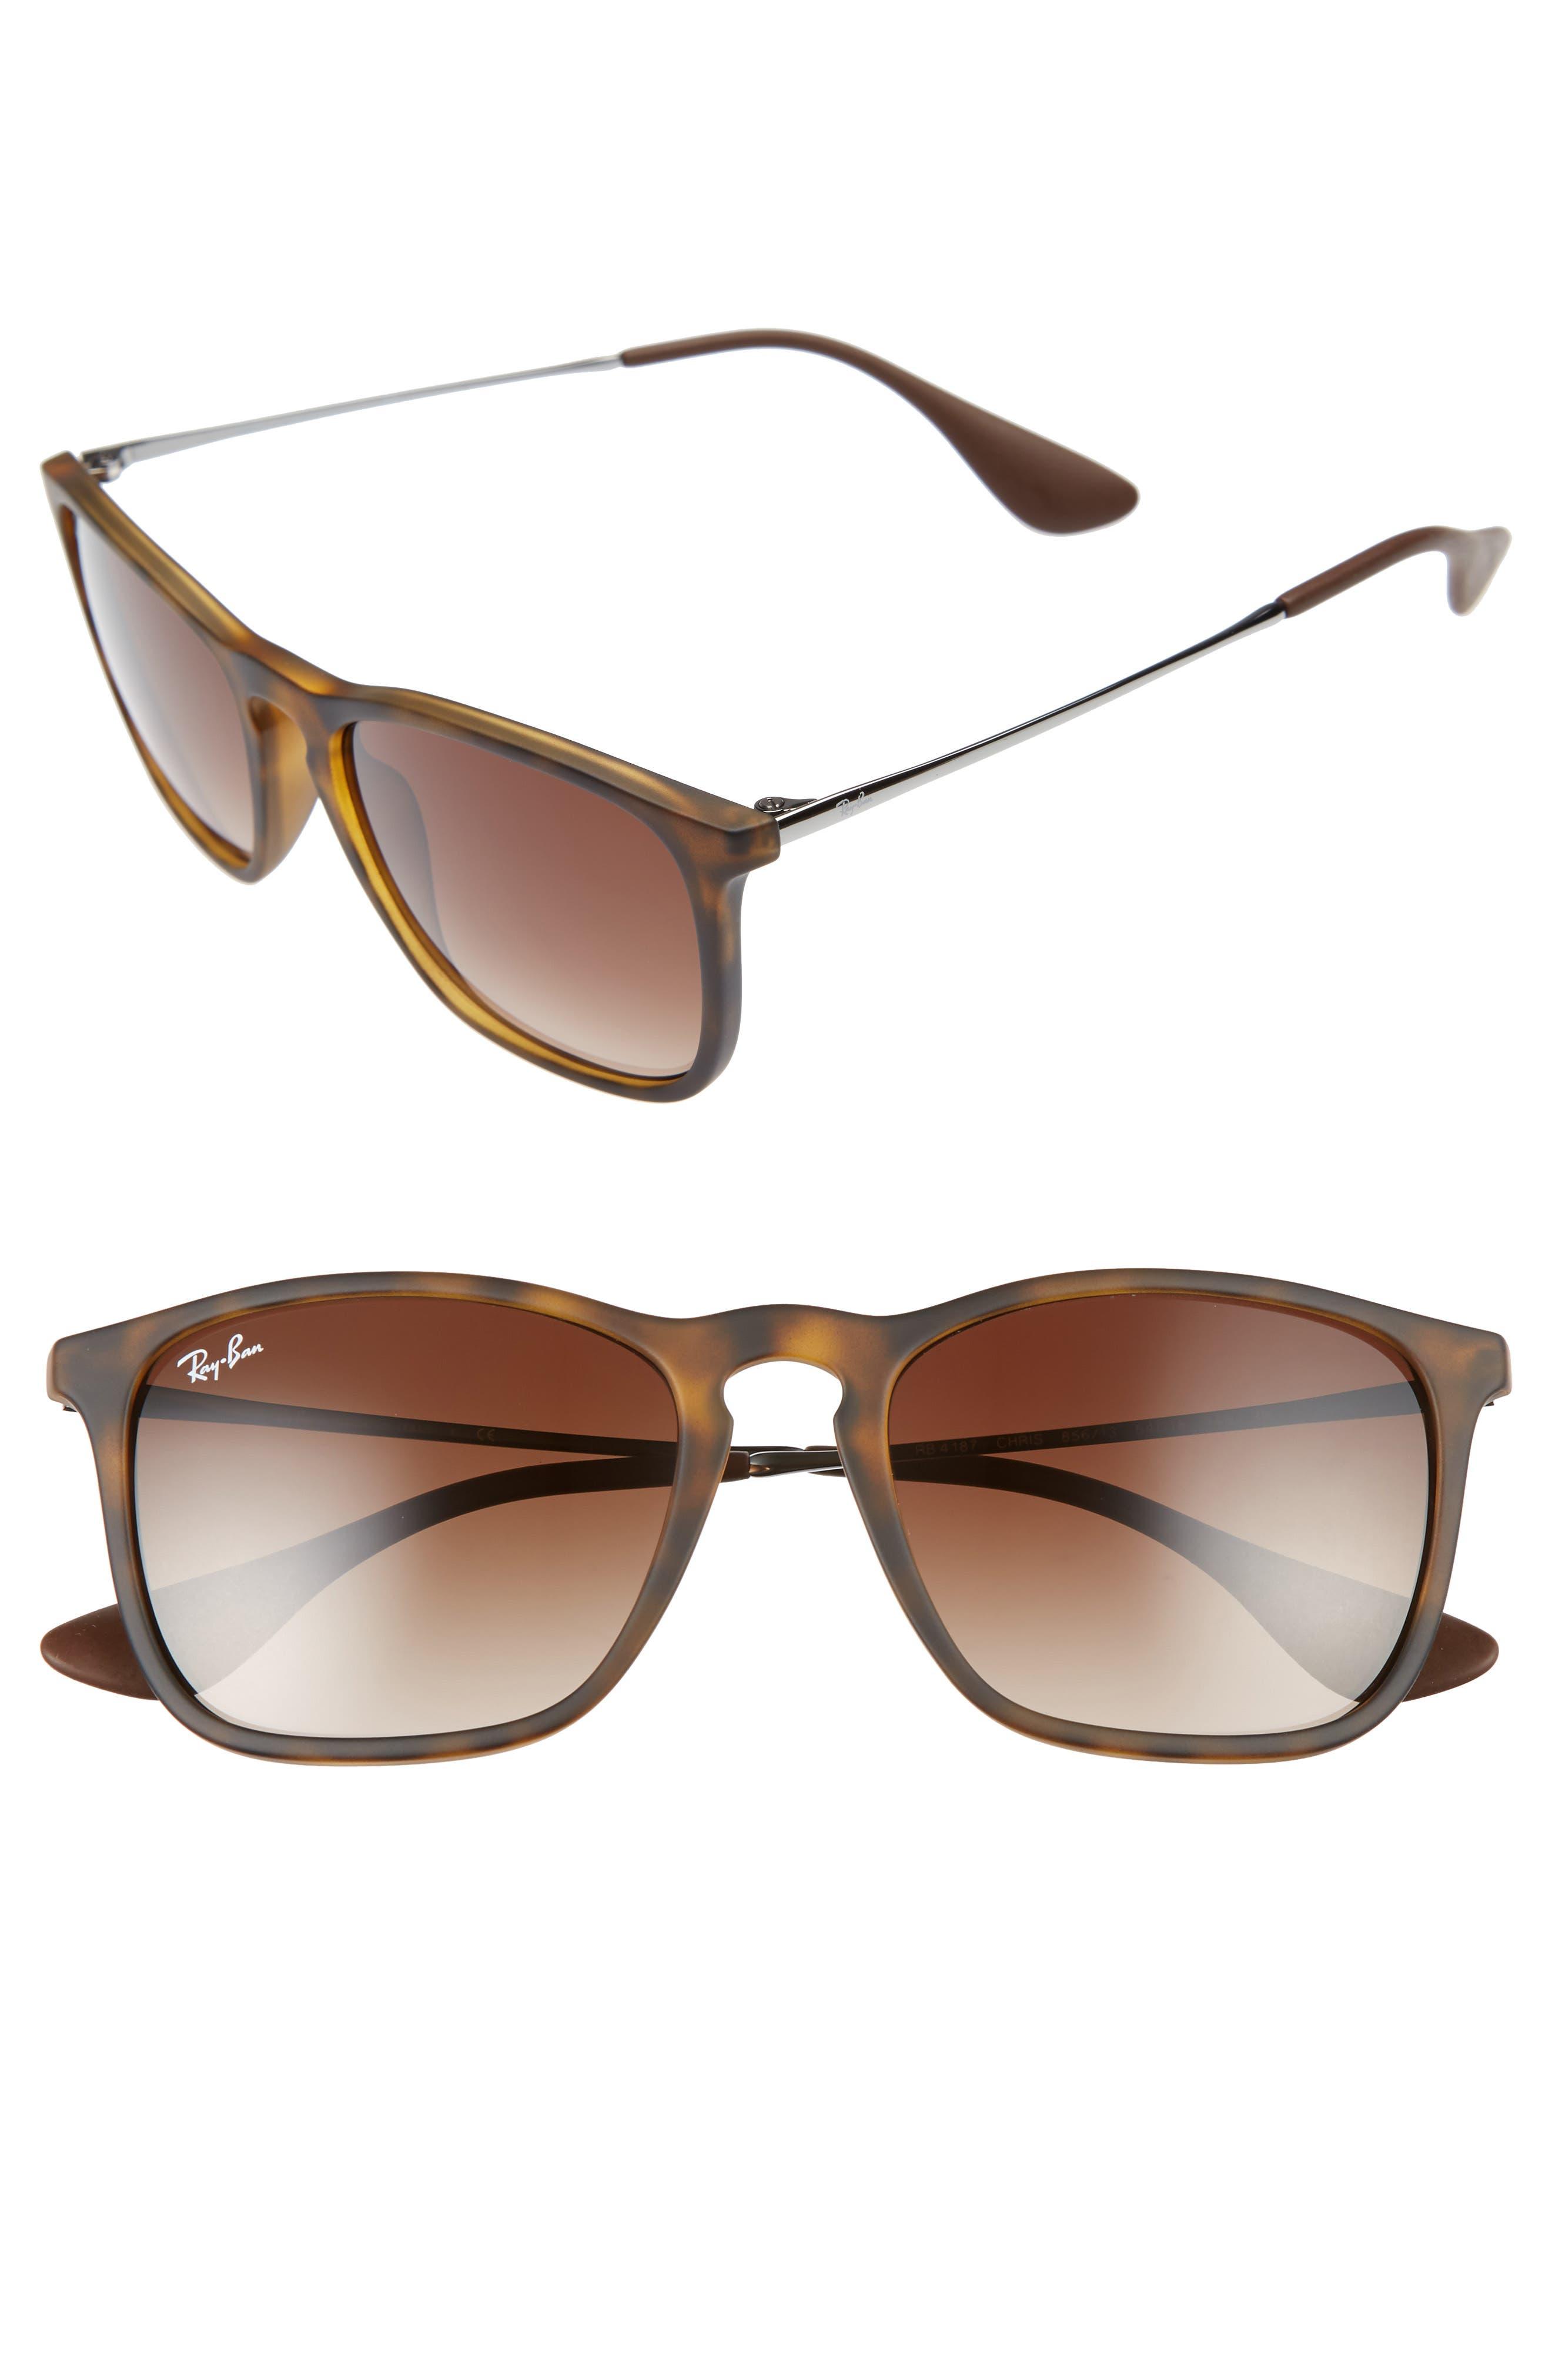 Main Image - Ray-Ban Chris 54mm Gradient Lens Sunglasses